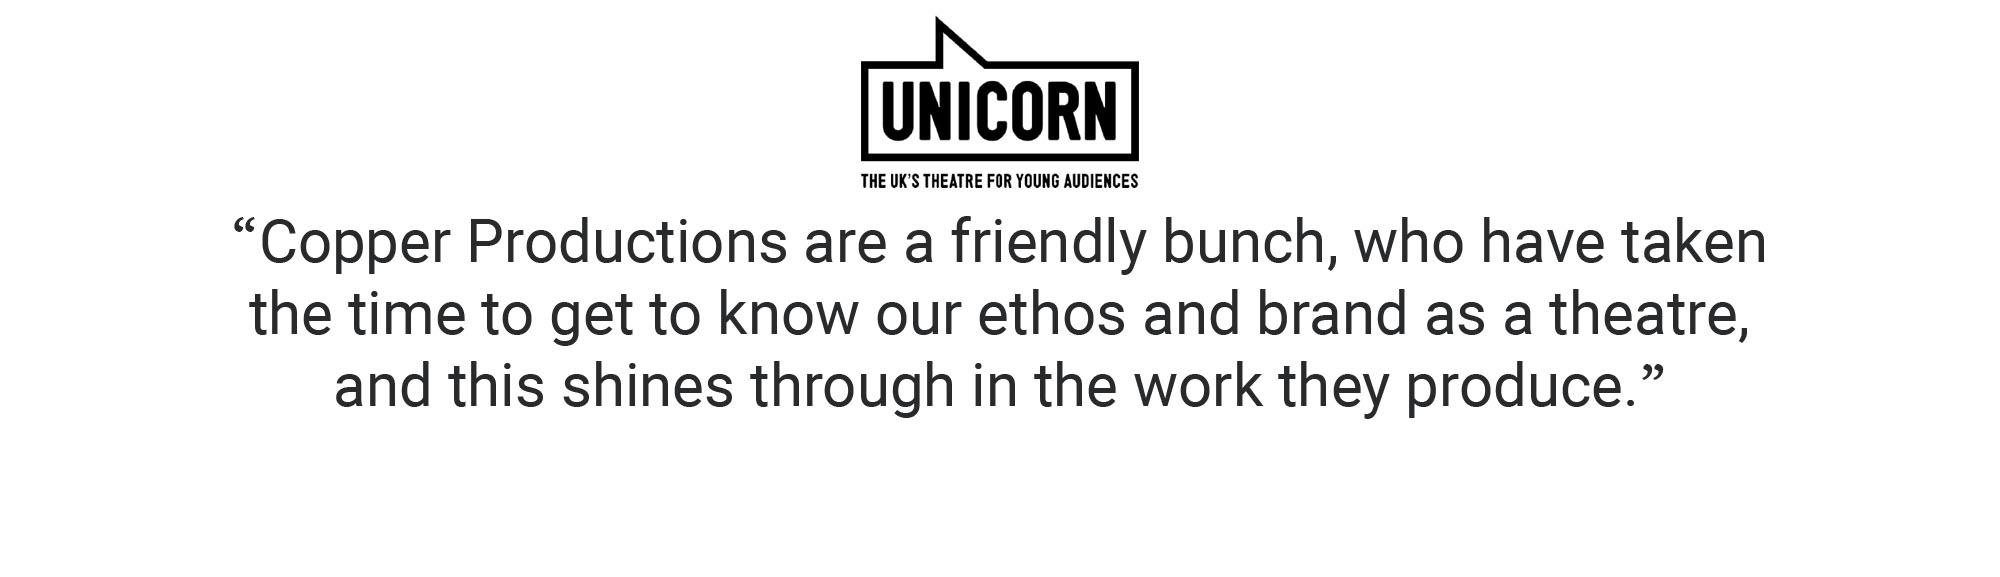 Unicorn Theatre Ethos and Brand Client Testimonial